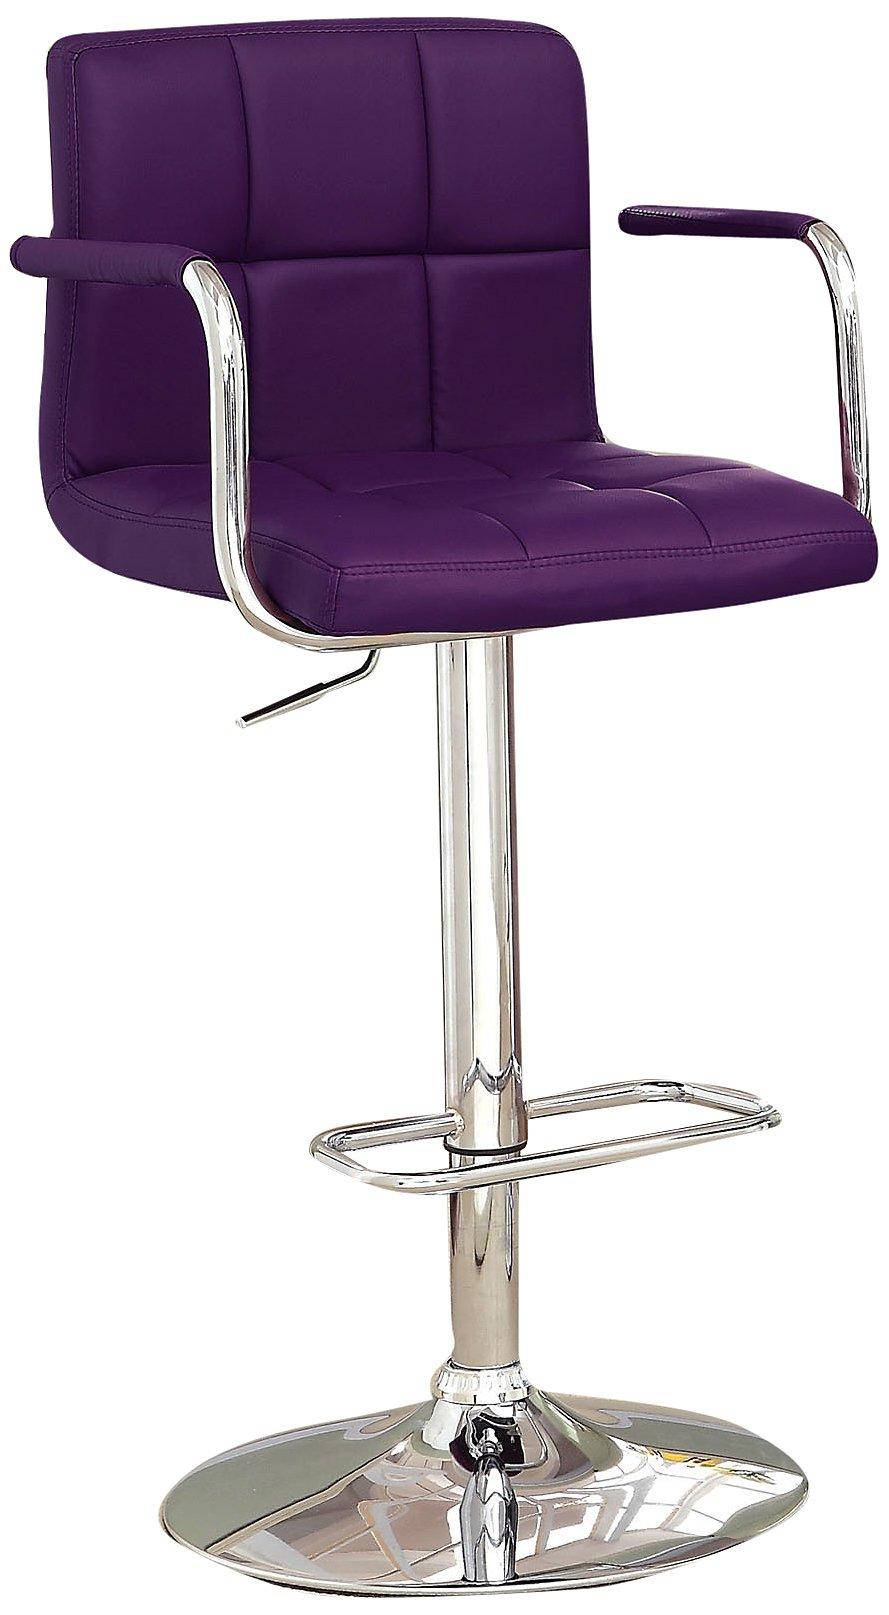 Furniture of America Modern Chelsea Leatherette Swivel Bar Stool, Purple by Furniture of America